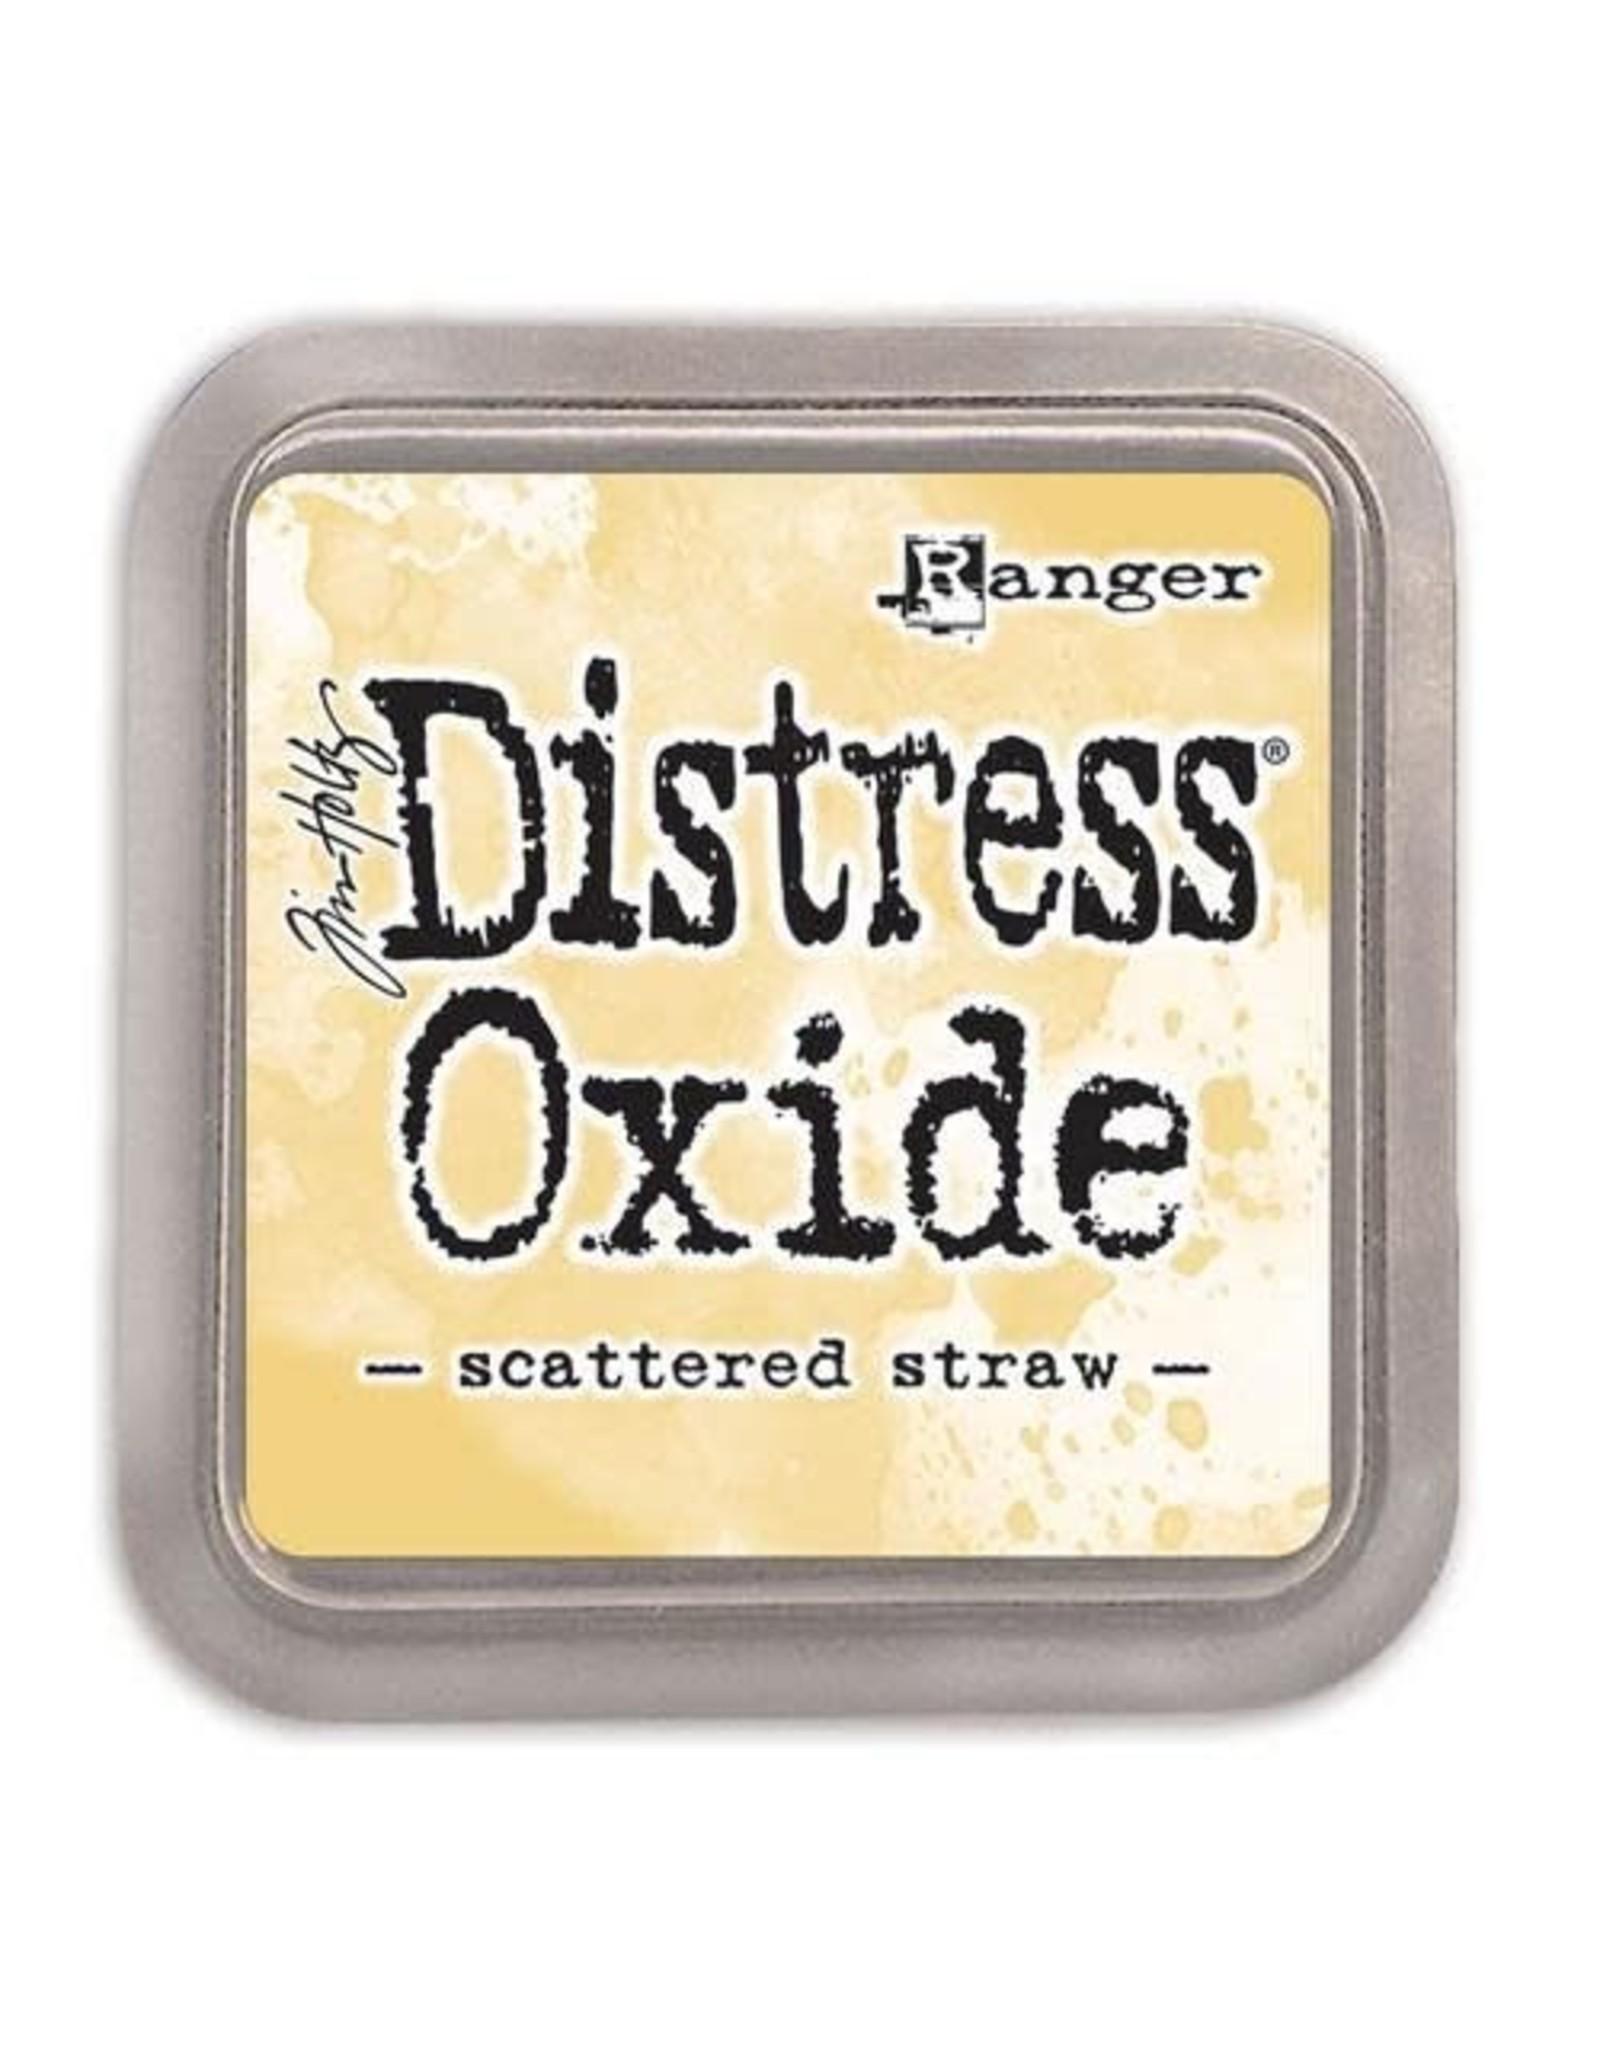 Ranger Distress Oxide Ranger Distress Oxide - Scattered Straw TDO56188 Tim Holtz